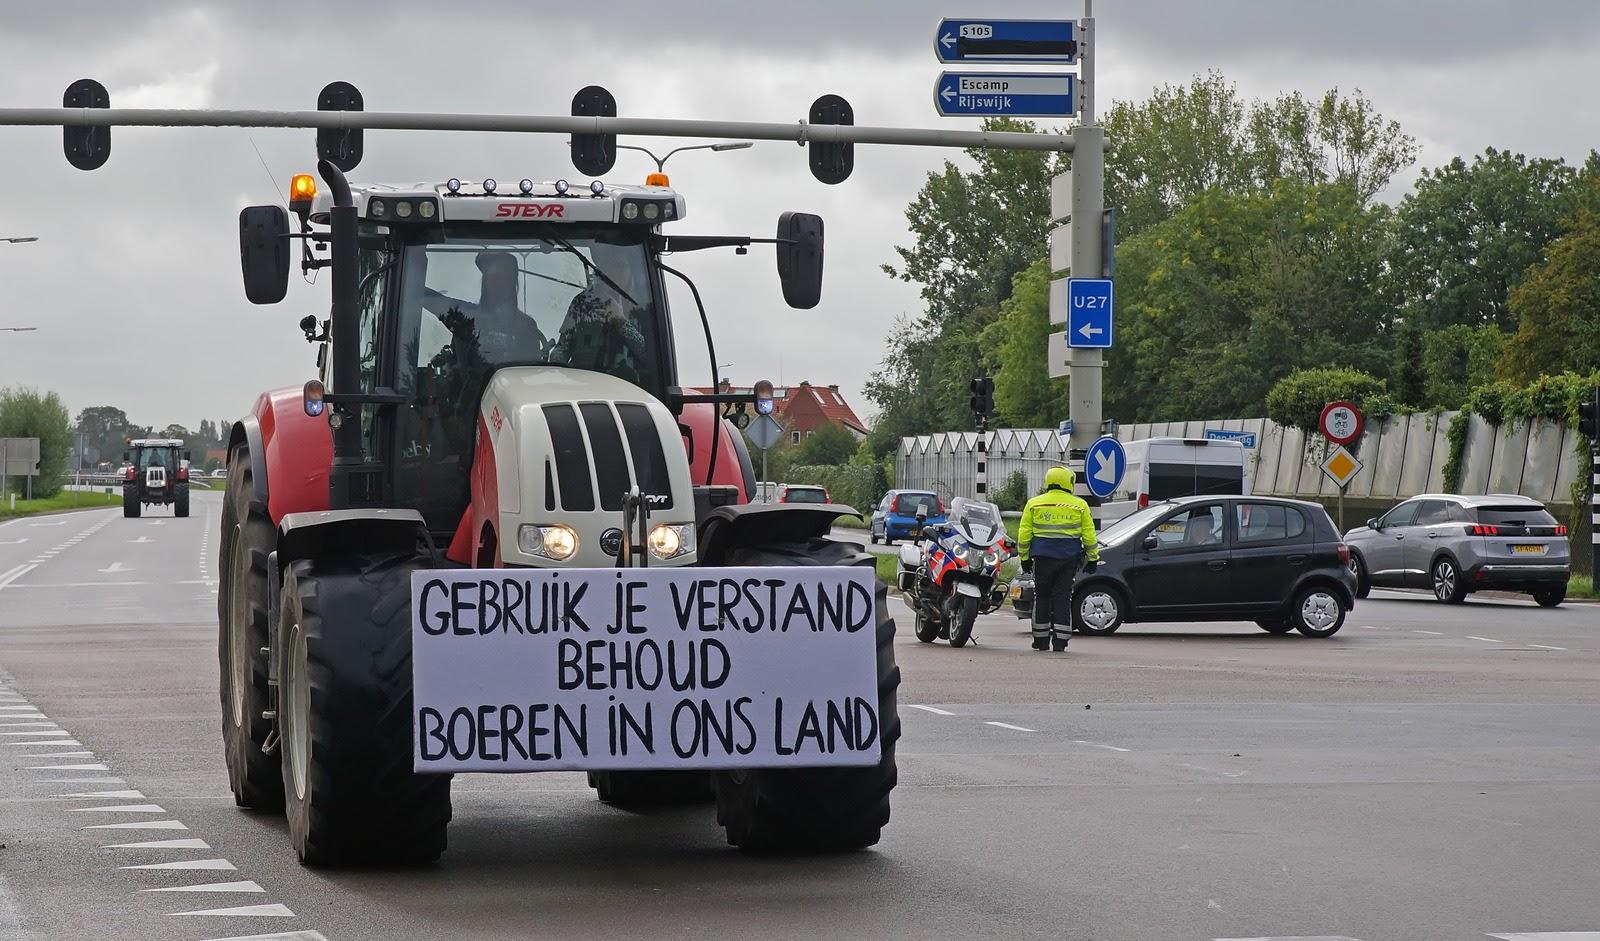 Протестующий фермер. Фото: Kees Torn/Wikimedia.